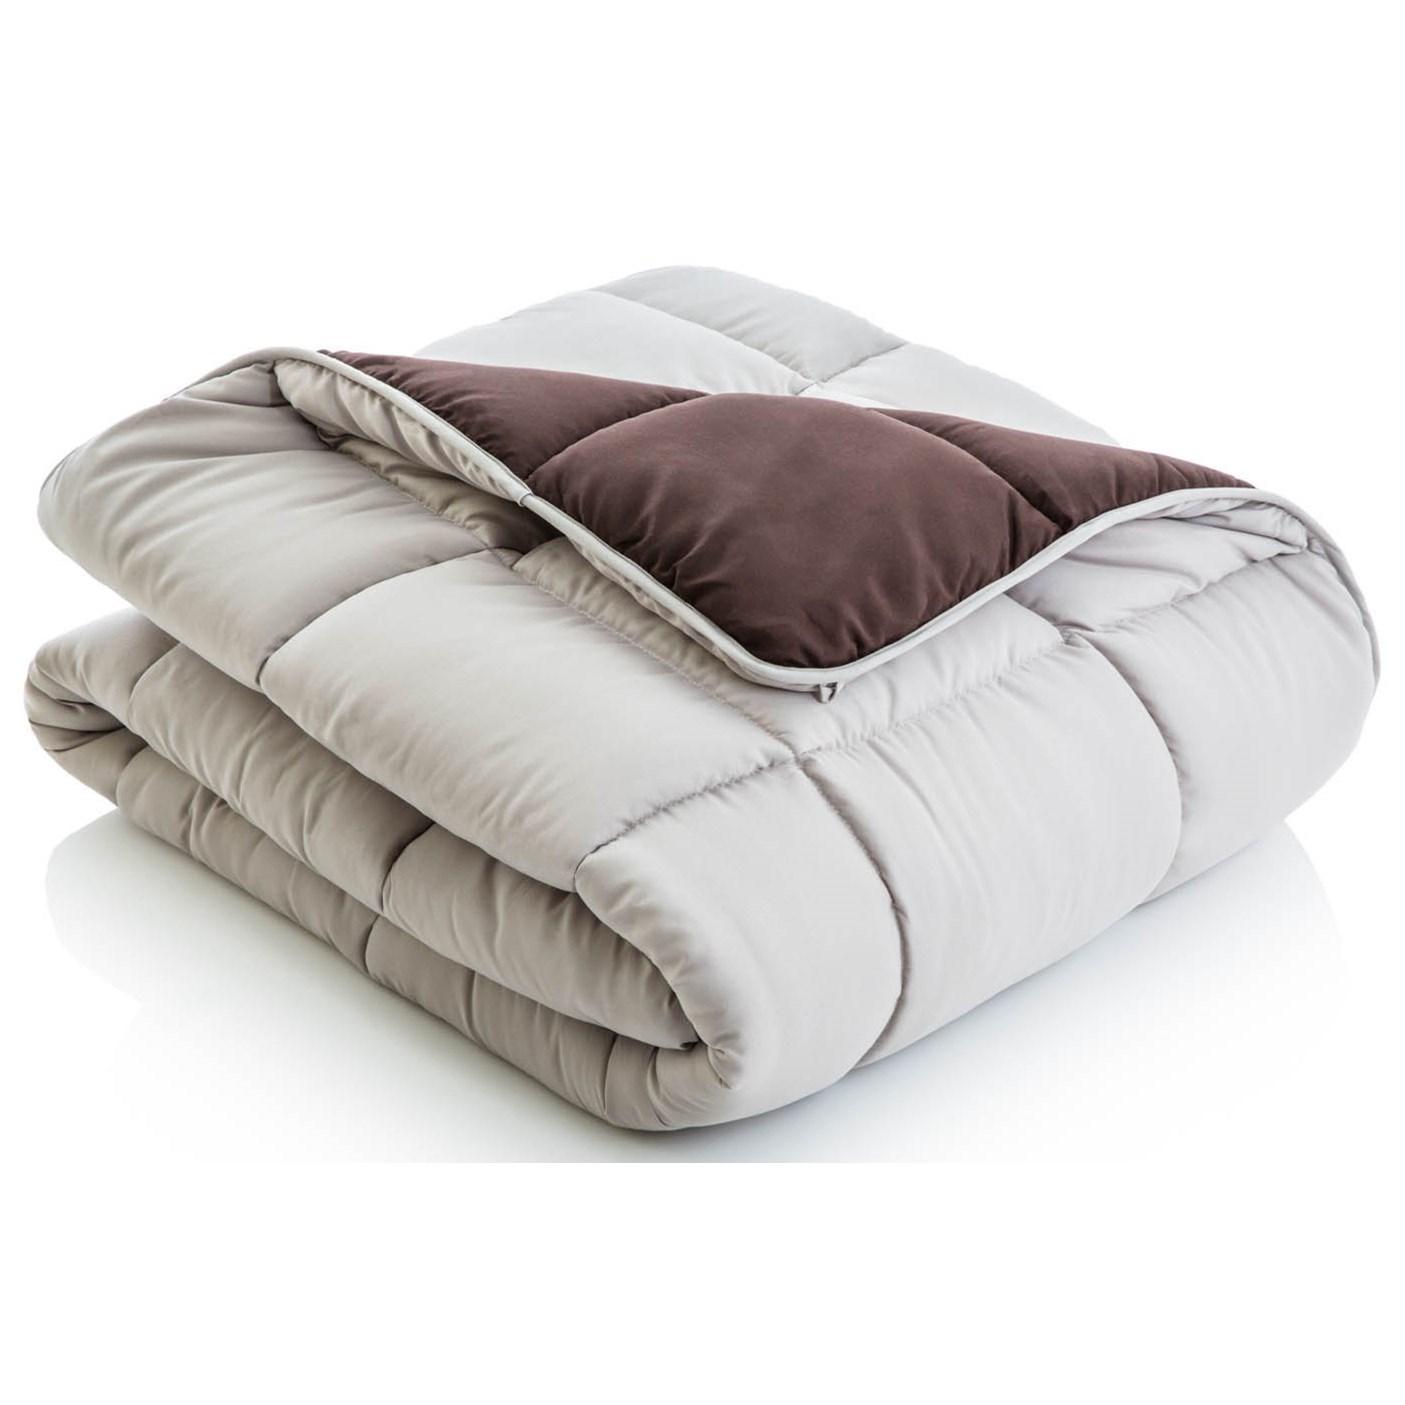 Malouf Reversible Bed in a Bag Split King Reversible Bed in a Bag - Item Number: MA01SKDRCOBB